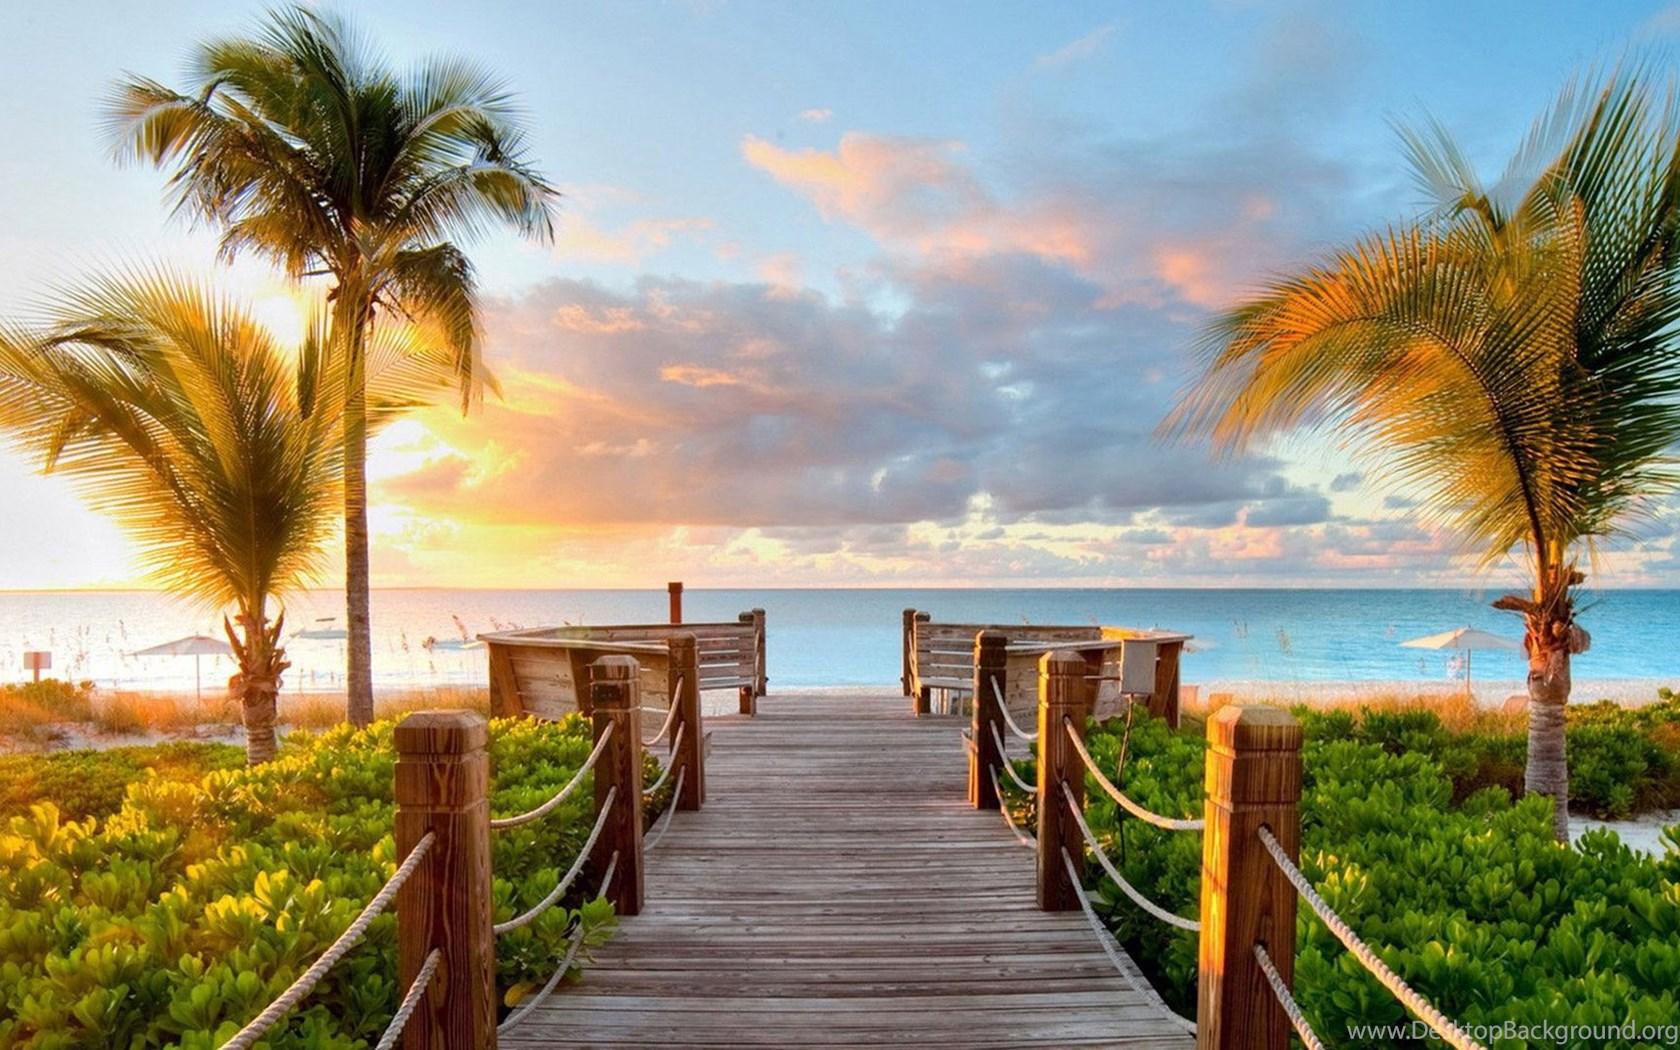 Tropical Summer Beach And View Of The Sea Bridge